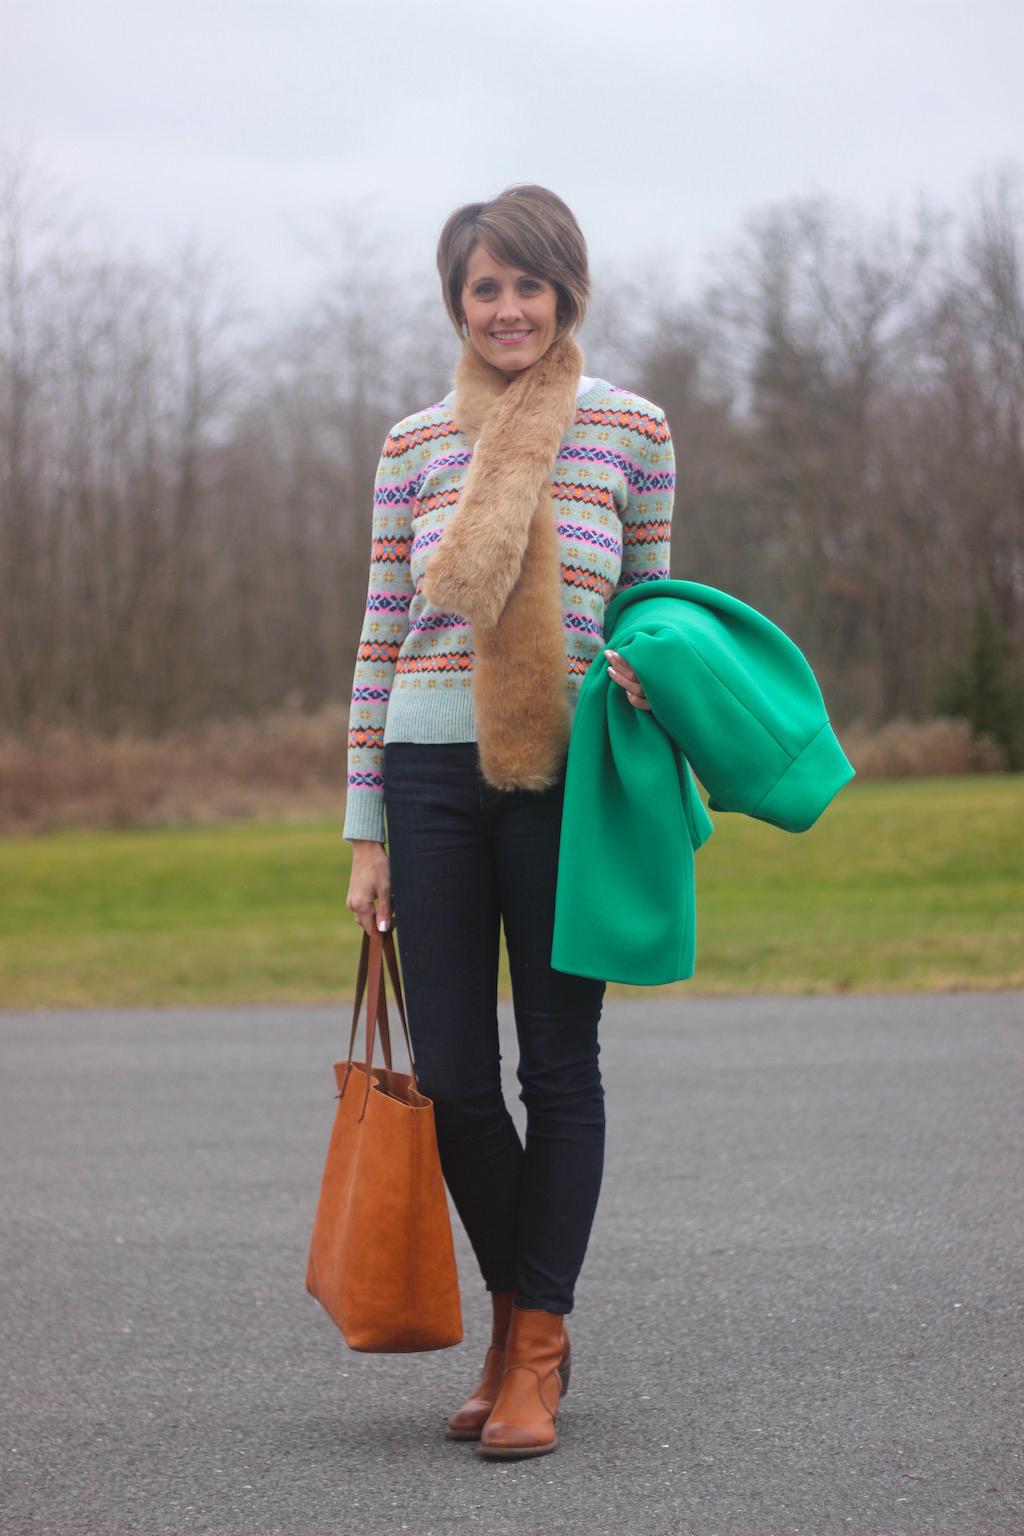 printsweater4 (1)